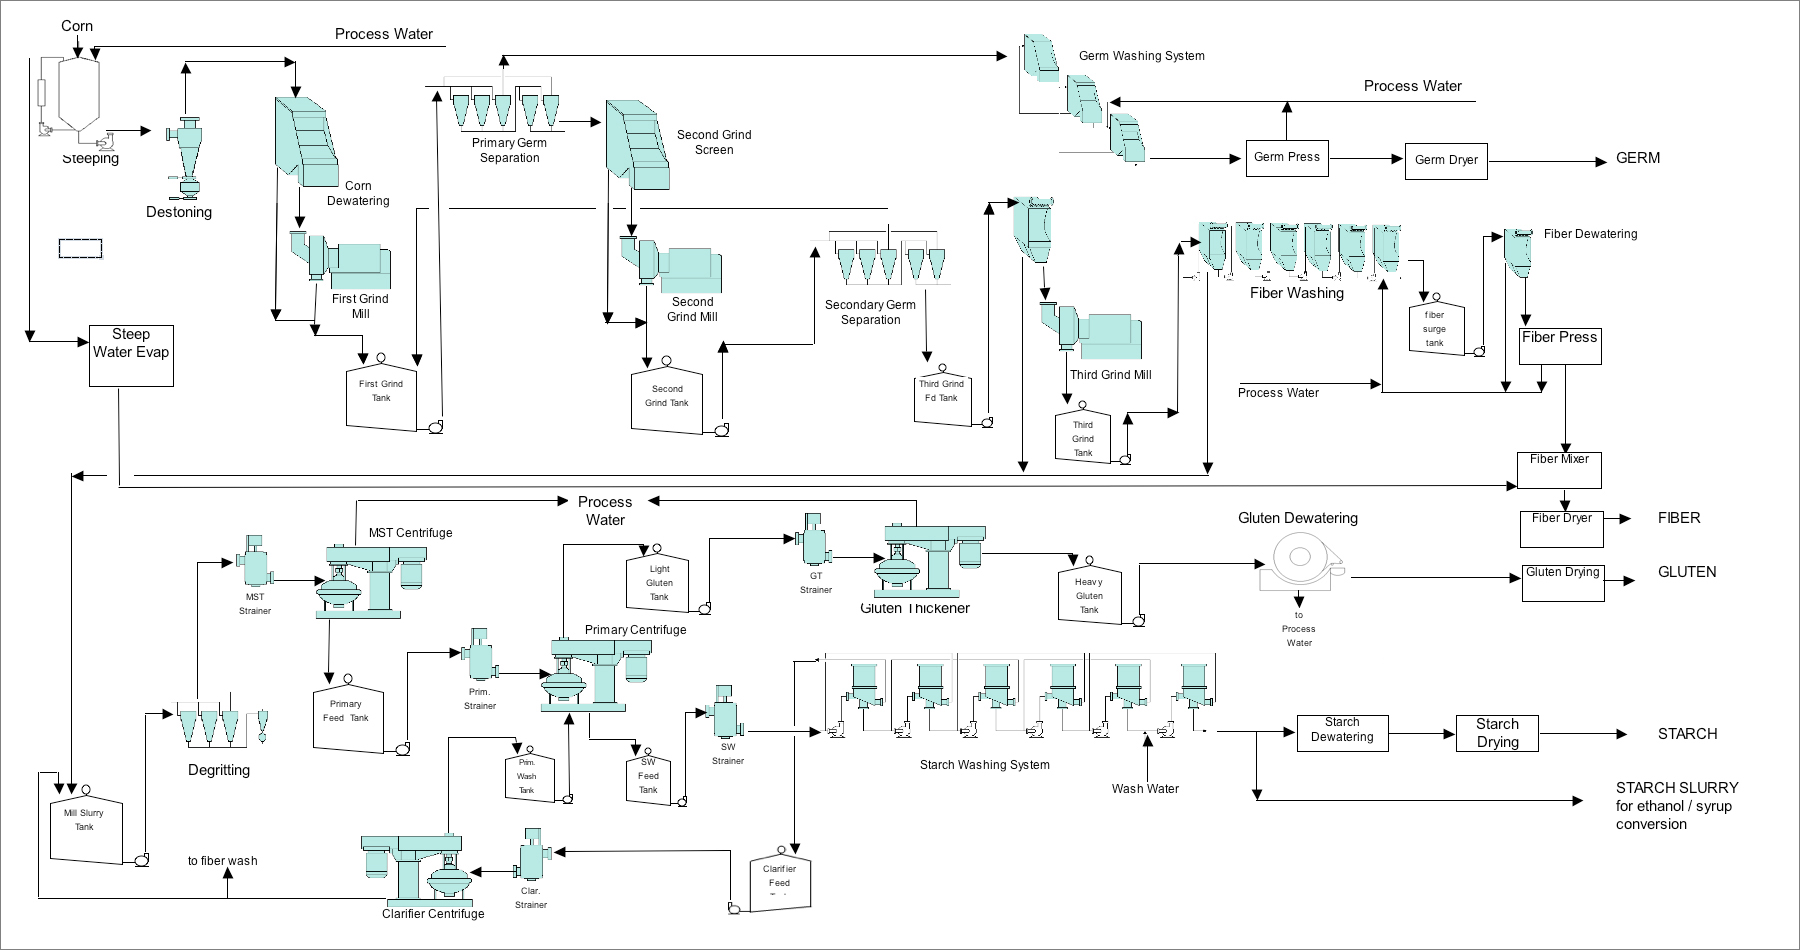 The Corn Wet Mill Process